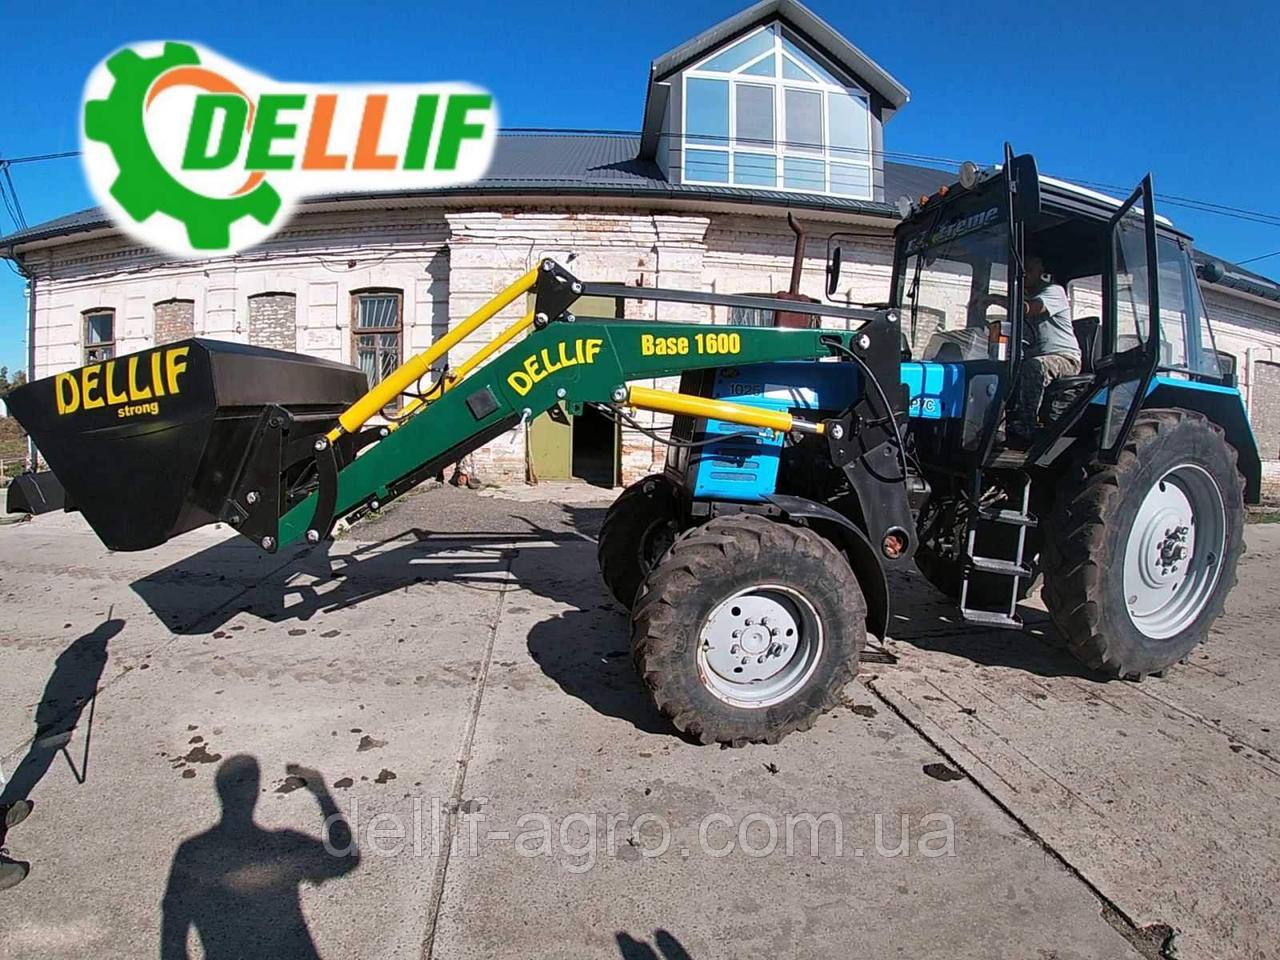 Погрузчик на трактор МТЗ ЮМЗ Т 40 Dellif Base 1600 с ковшом 1.8 м